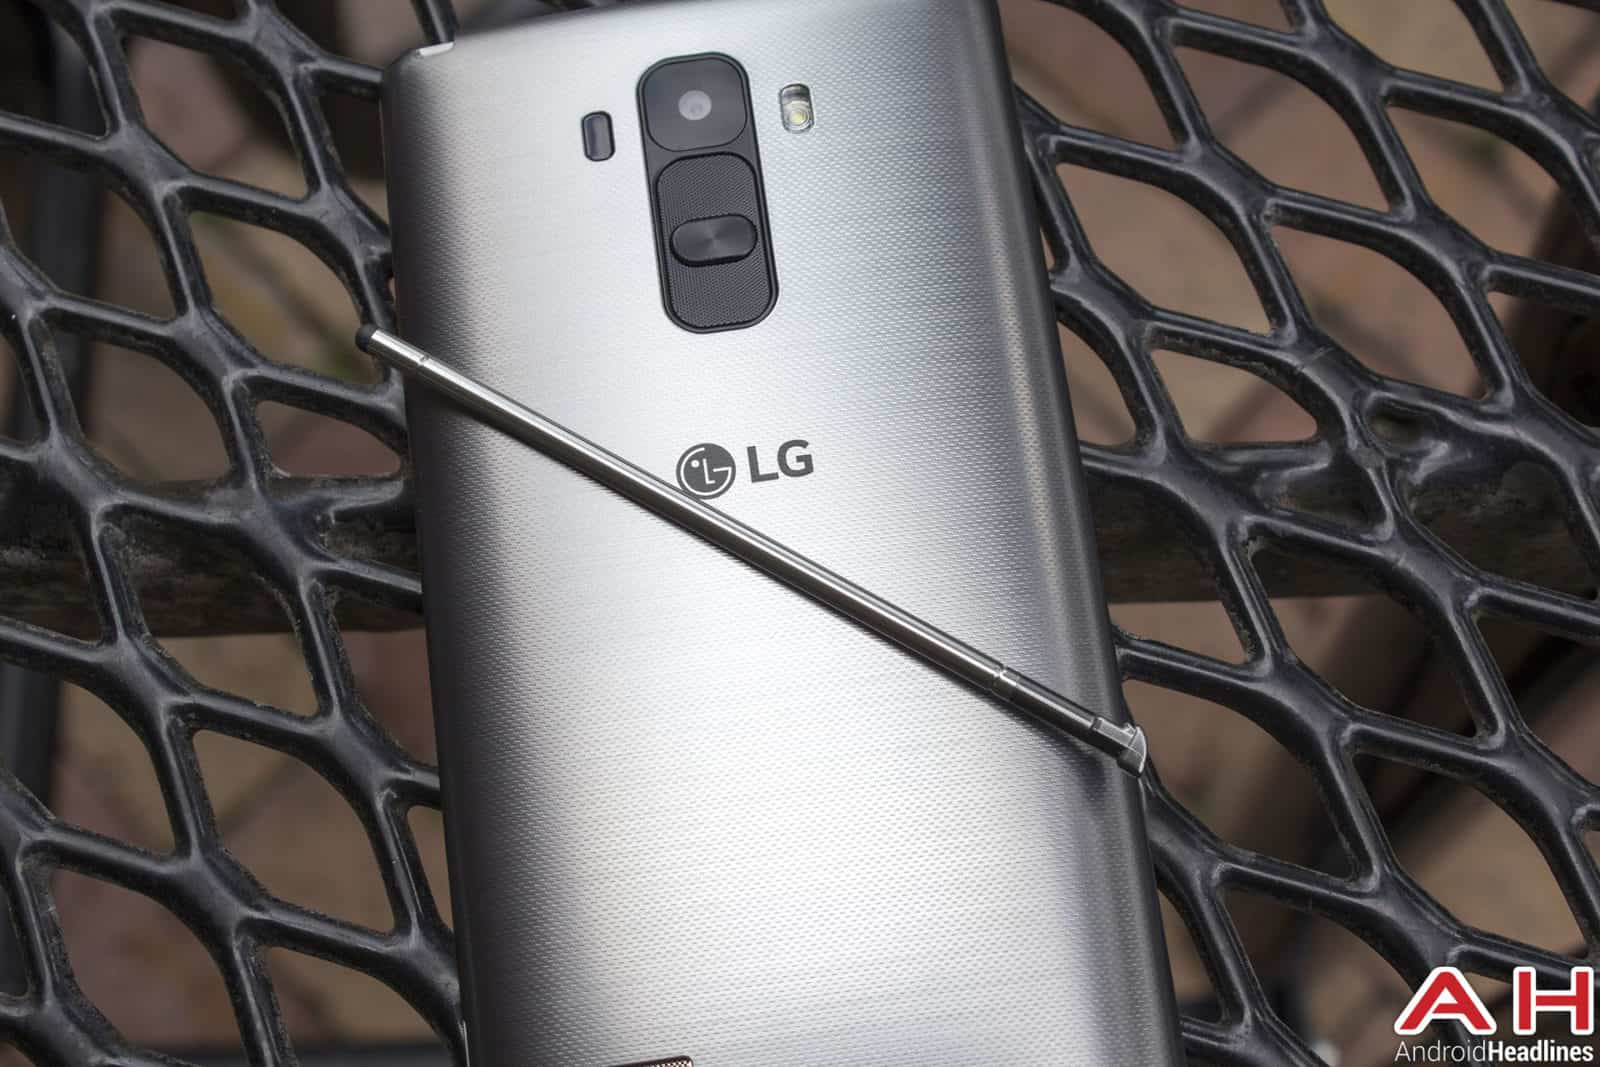 LG-G-Stylo-Review-AH-stylus-2